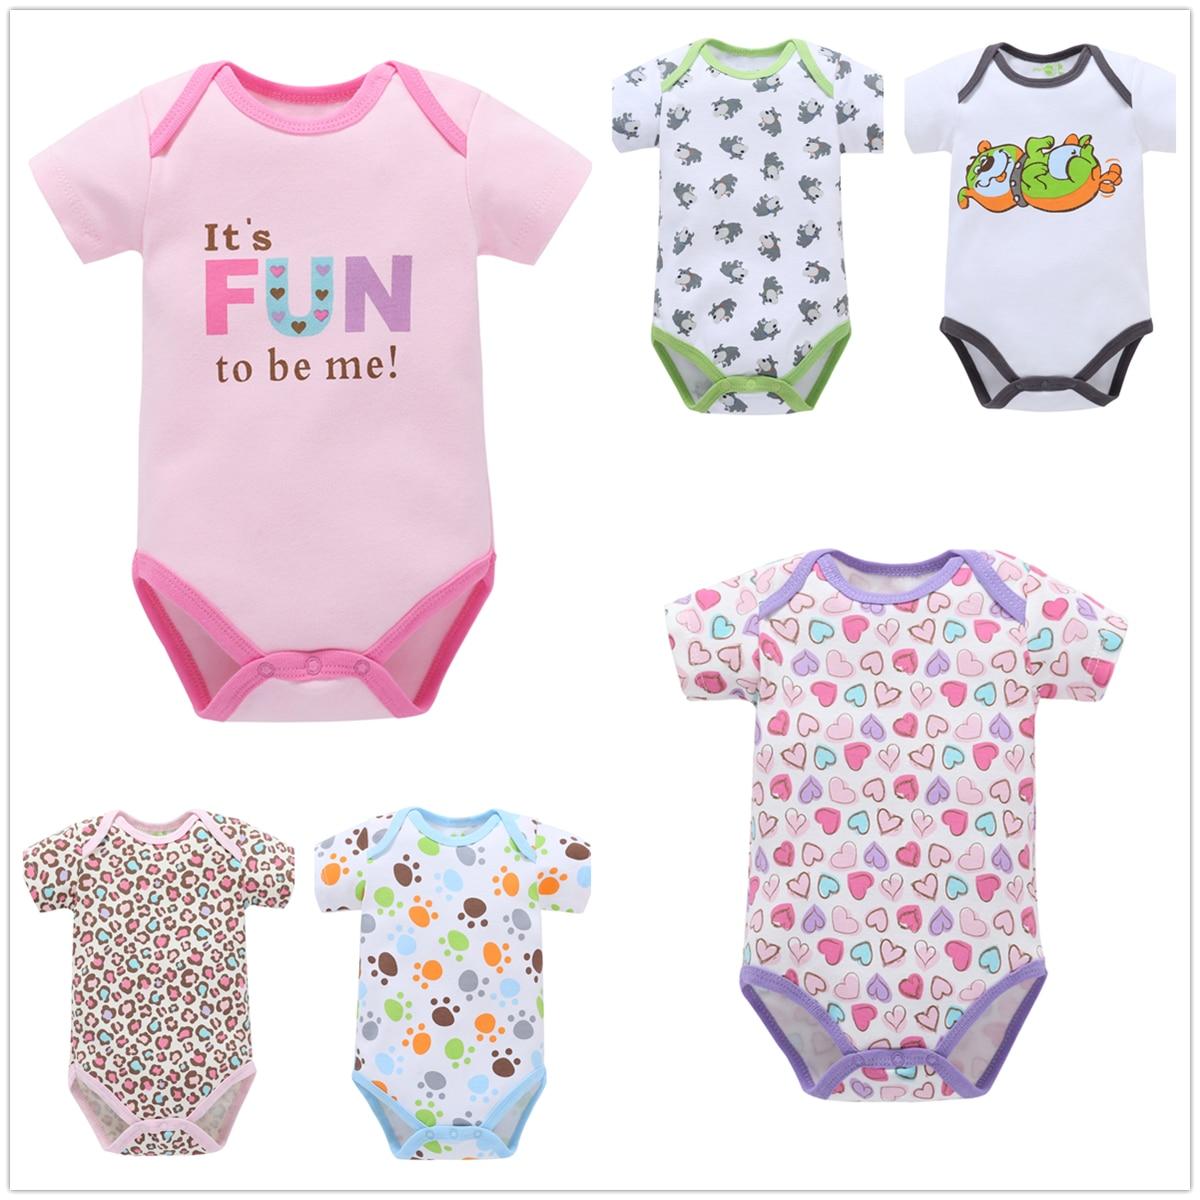 f3973274efa 0-12M Cute Baby Clothes Newborn Baby Rompers Cotton Baby Girl Romper Boy  Newborn Clothes Summer Unisex Jumpsuit Infant Playsuit